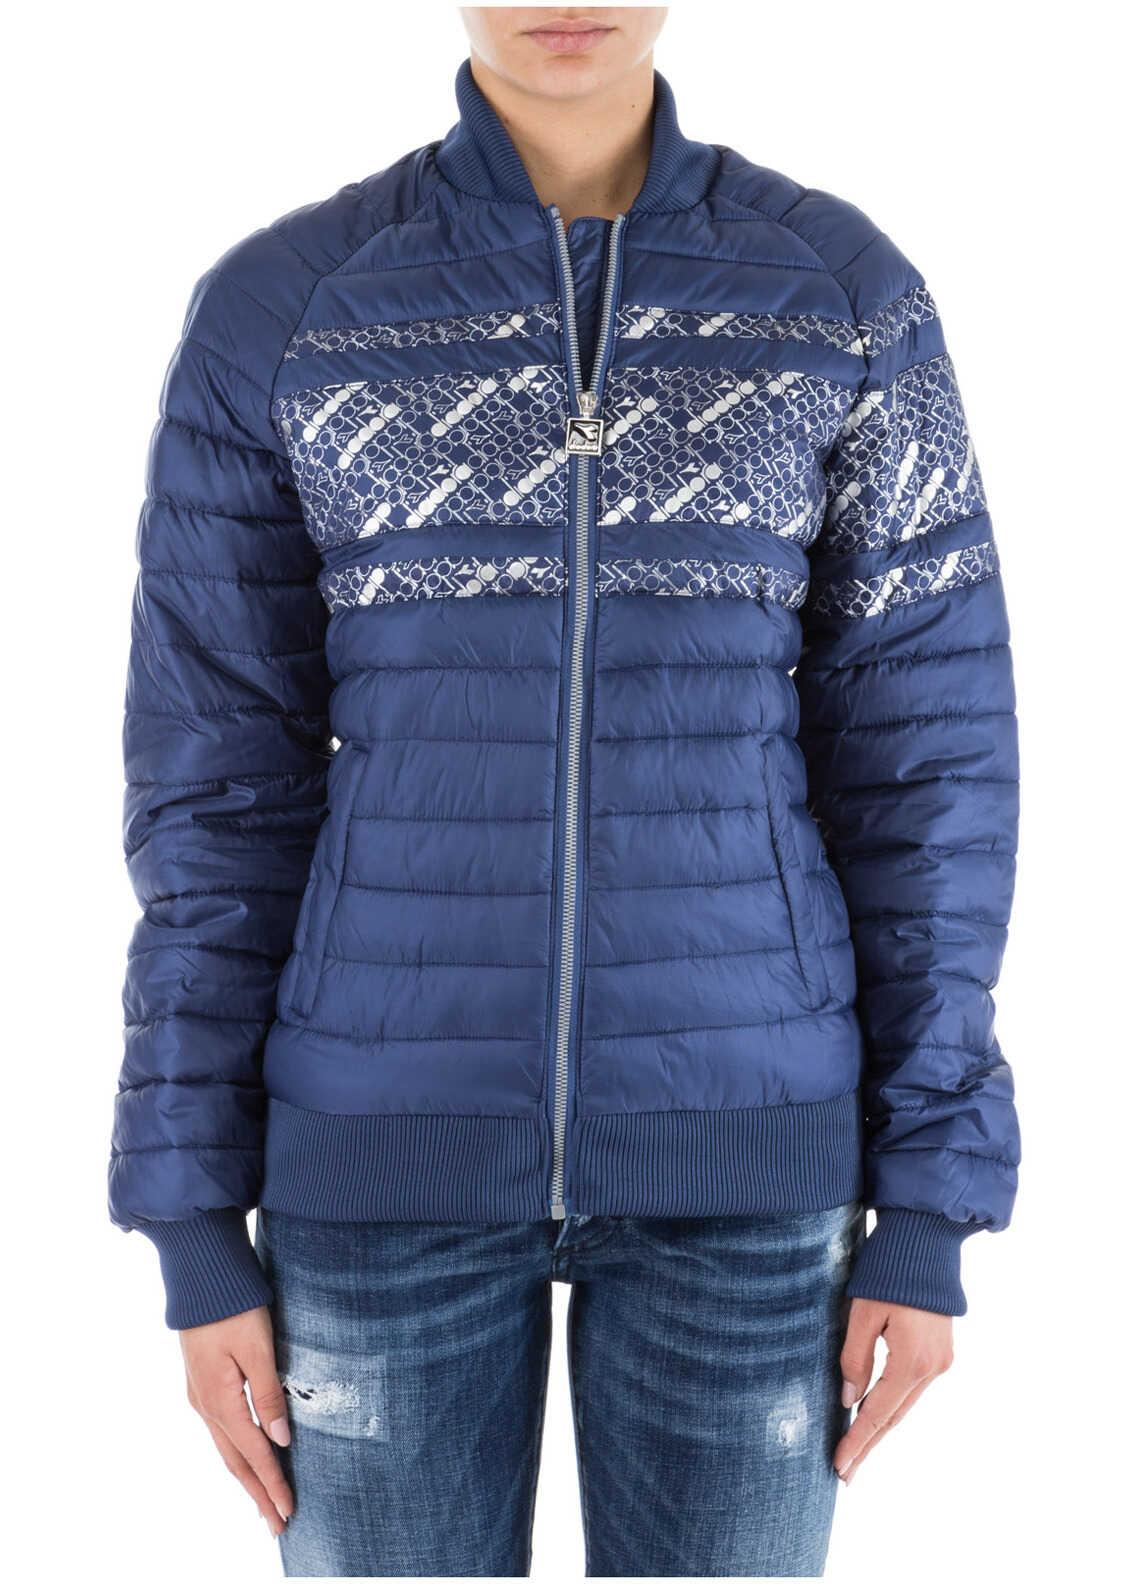 Diadora Jacket Blouson Blue